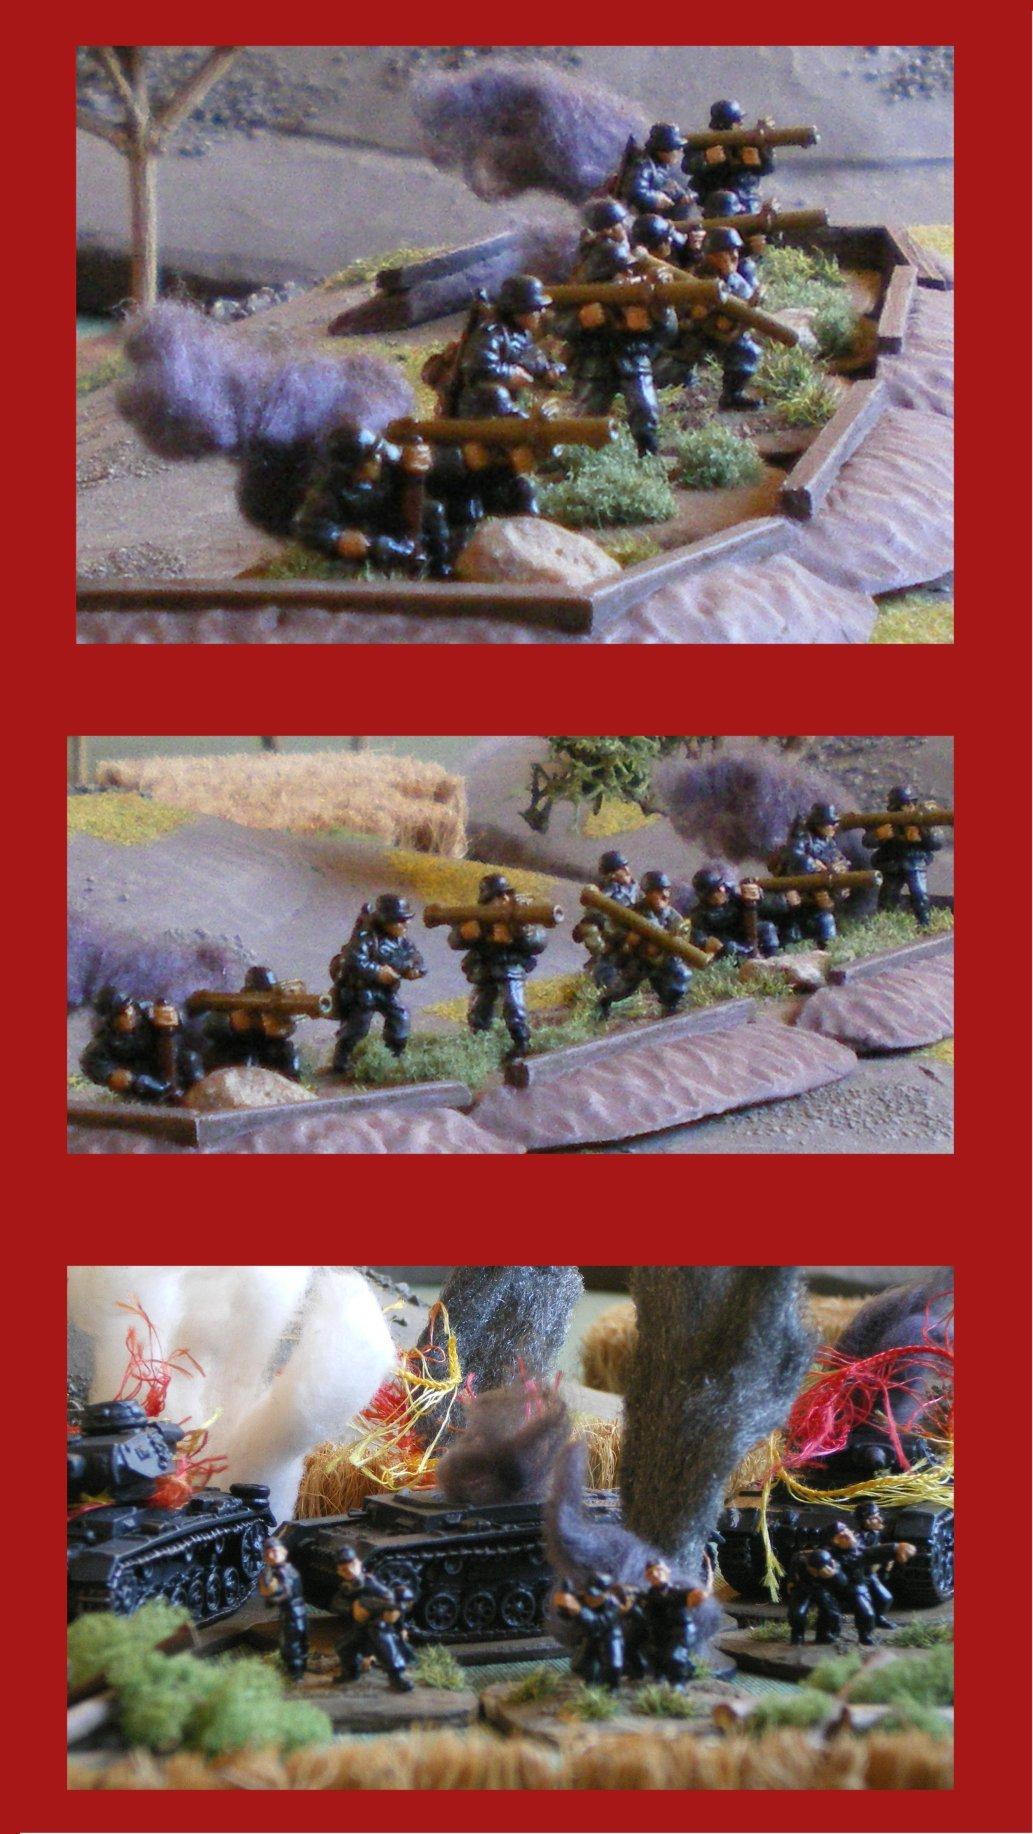 Panzerschreck Verrat! 160120125724338998